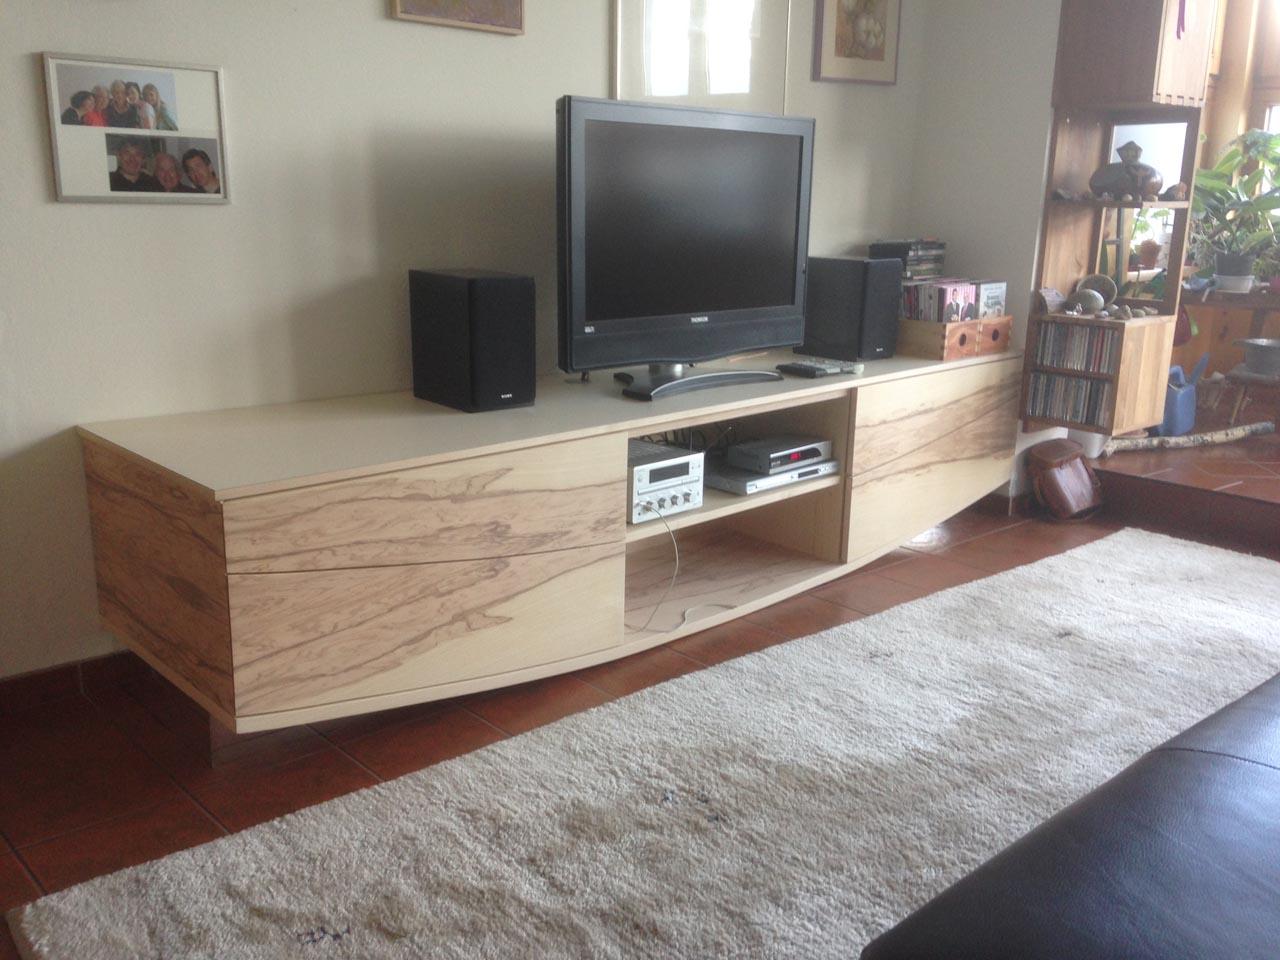 design fernsehm bel lifestyle tischlerei thomas w tzer. Black Bedroom Furniture Sets. Home Design Ideas